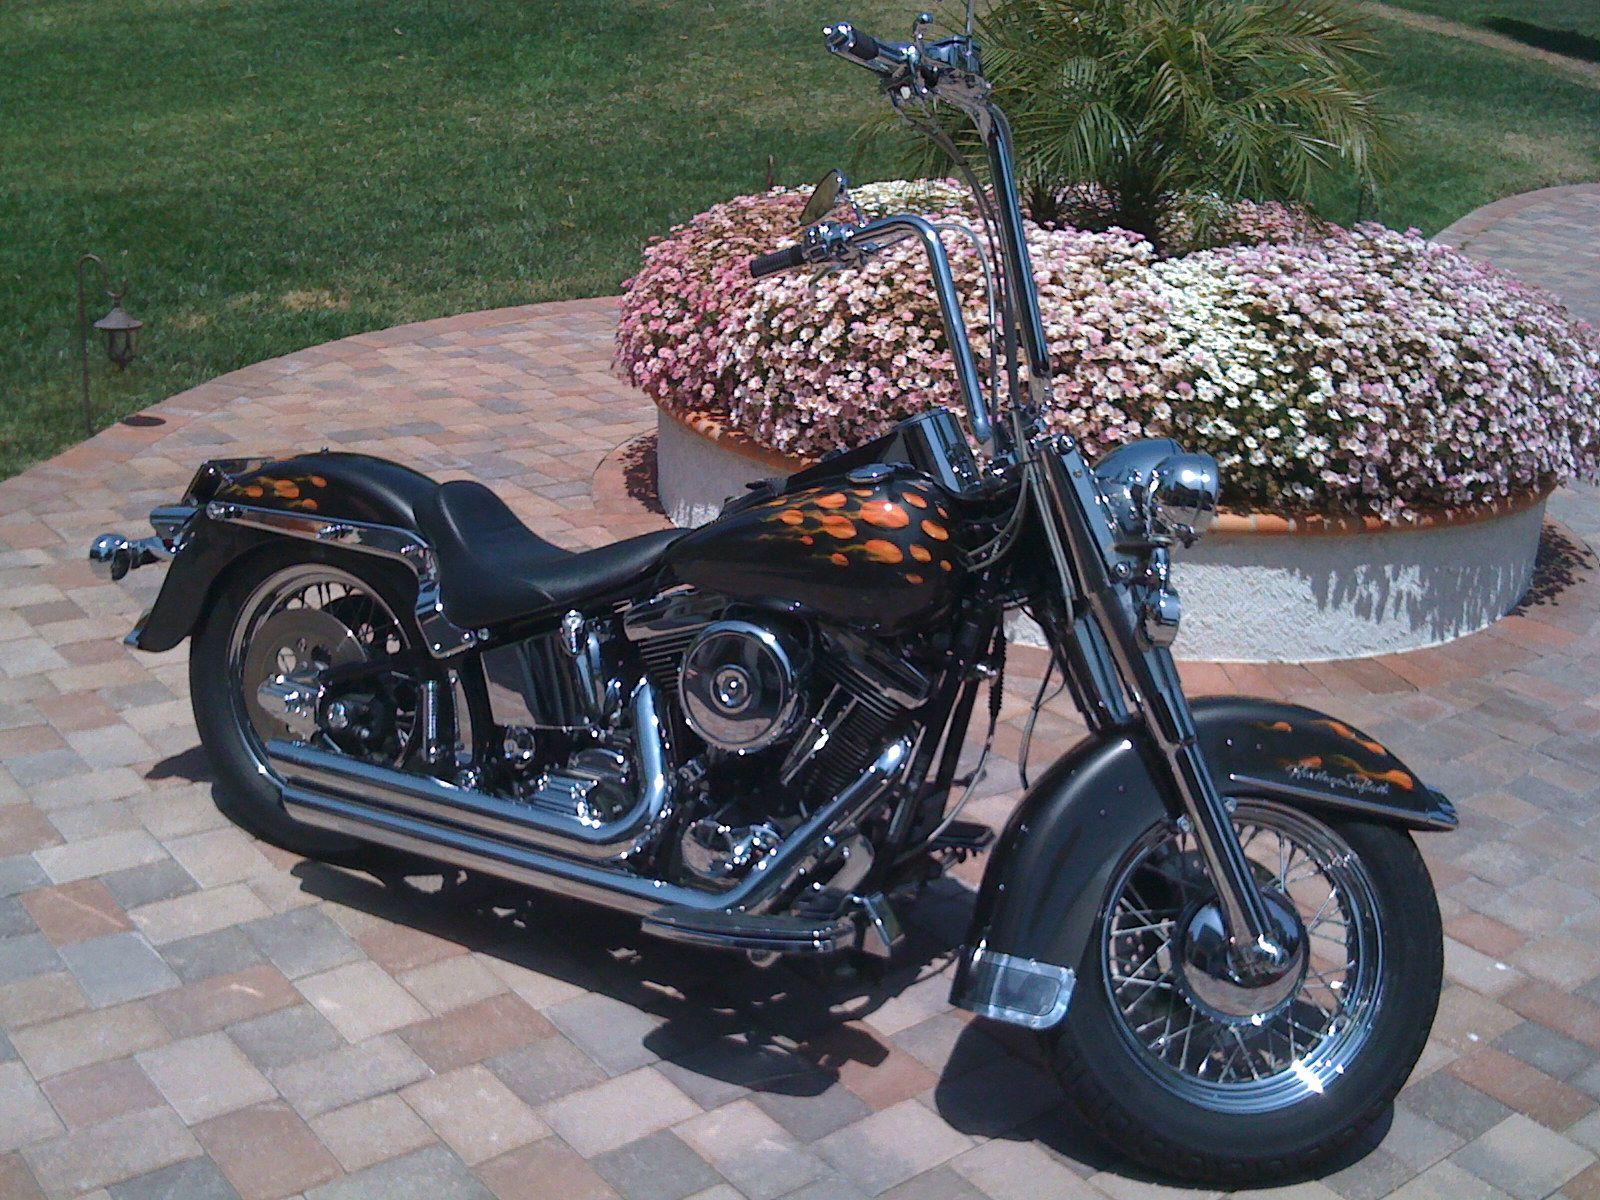 My 1998 Harley Heritage Softail Classic Custom Paint And Lots Of Chrome Softail Custom Paint Harley [ 1200 x 1600 Pixel ]